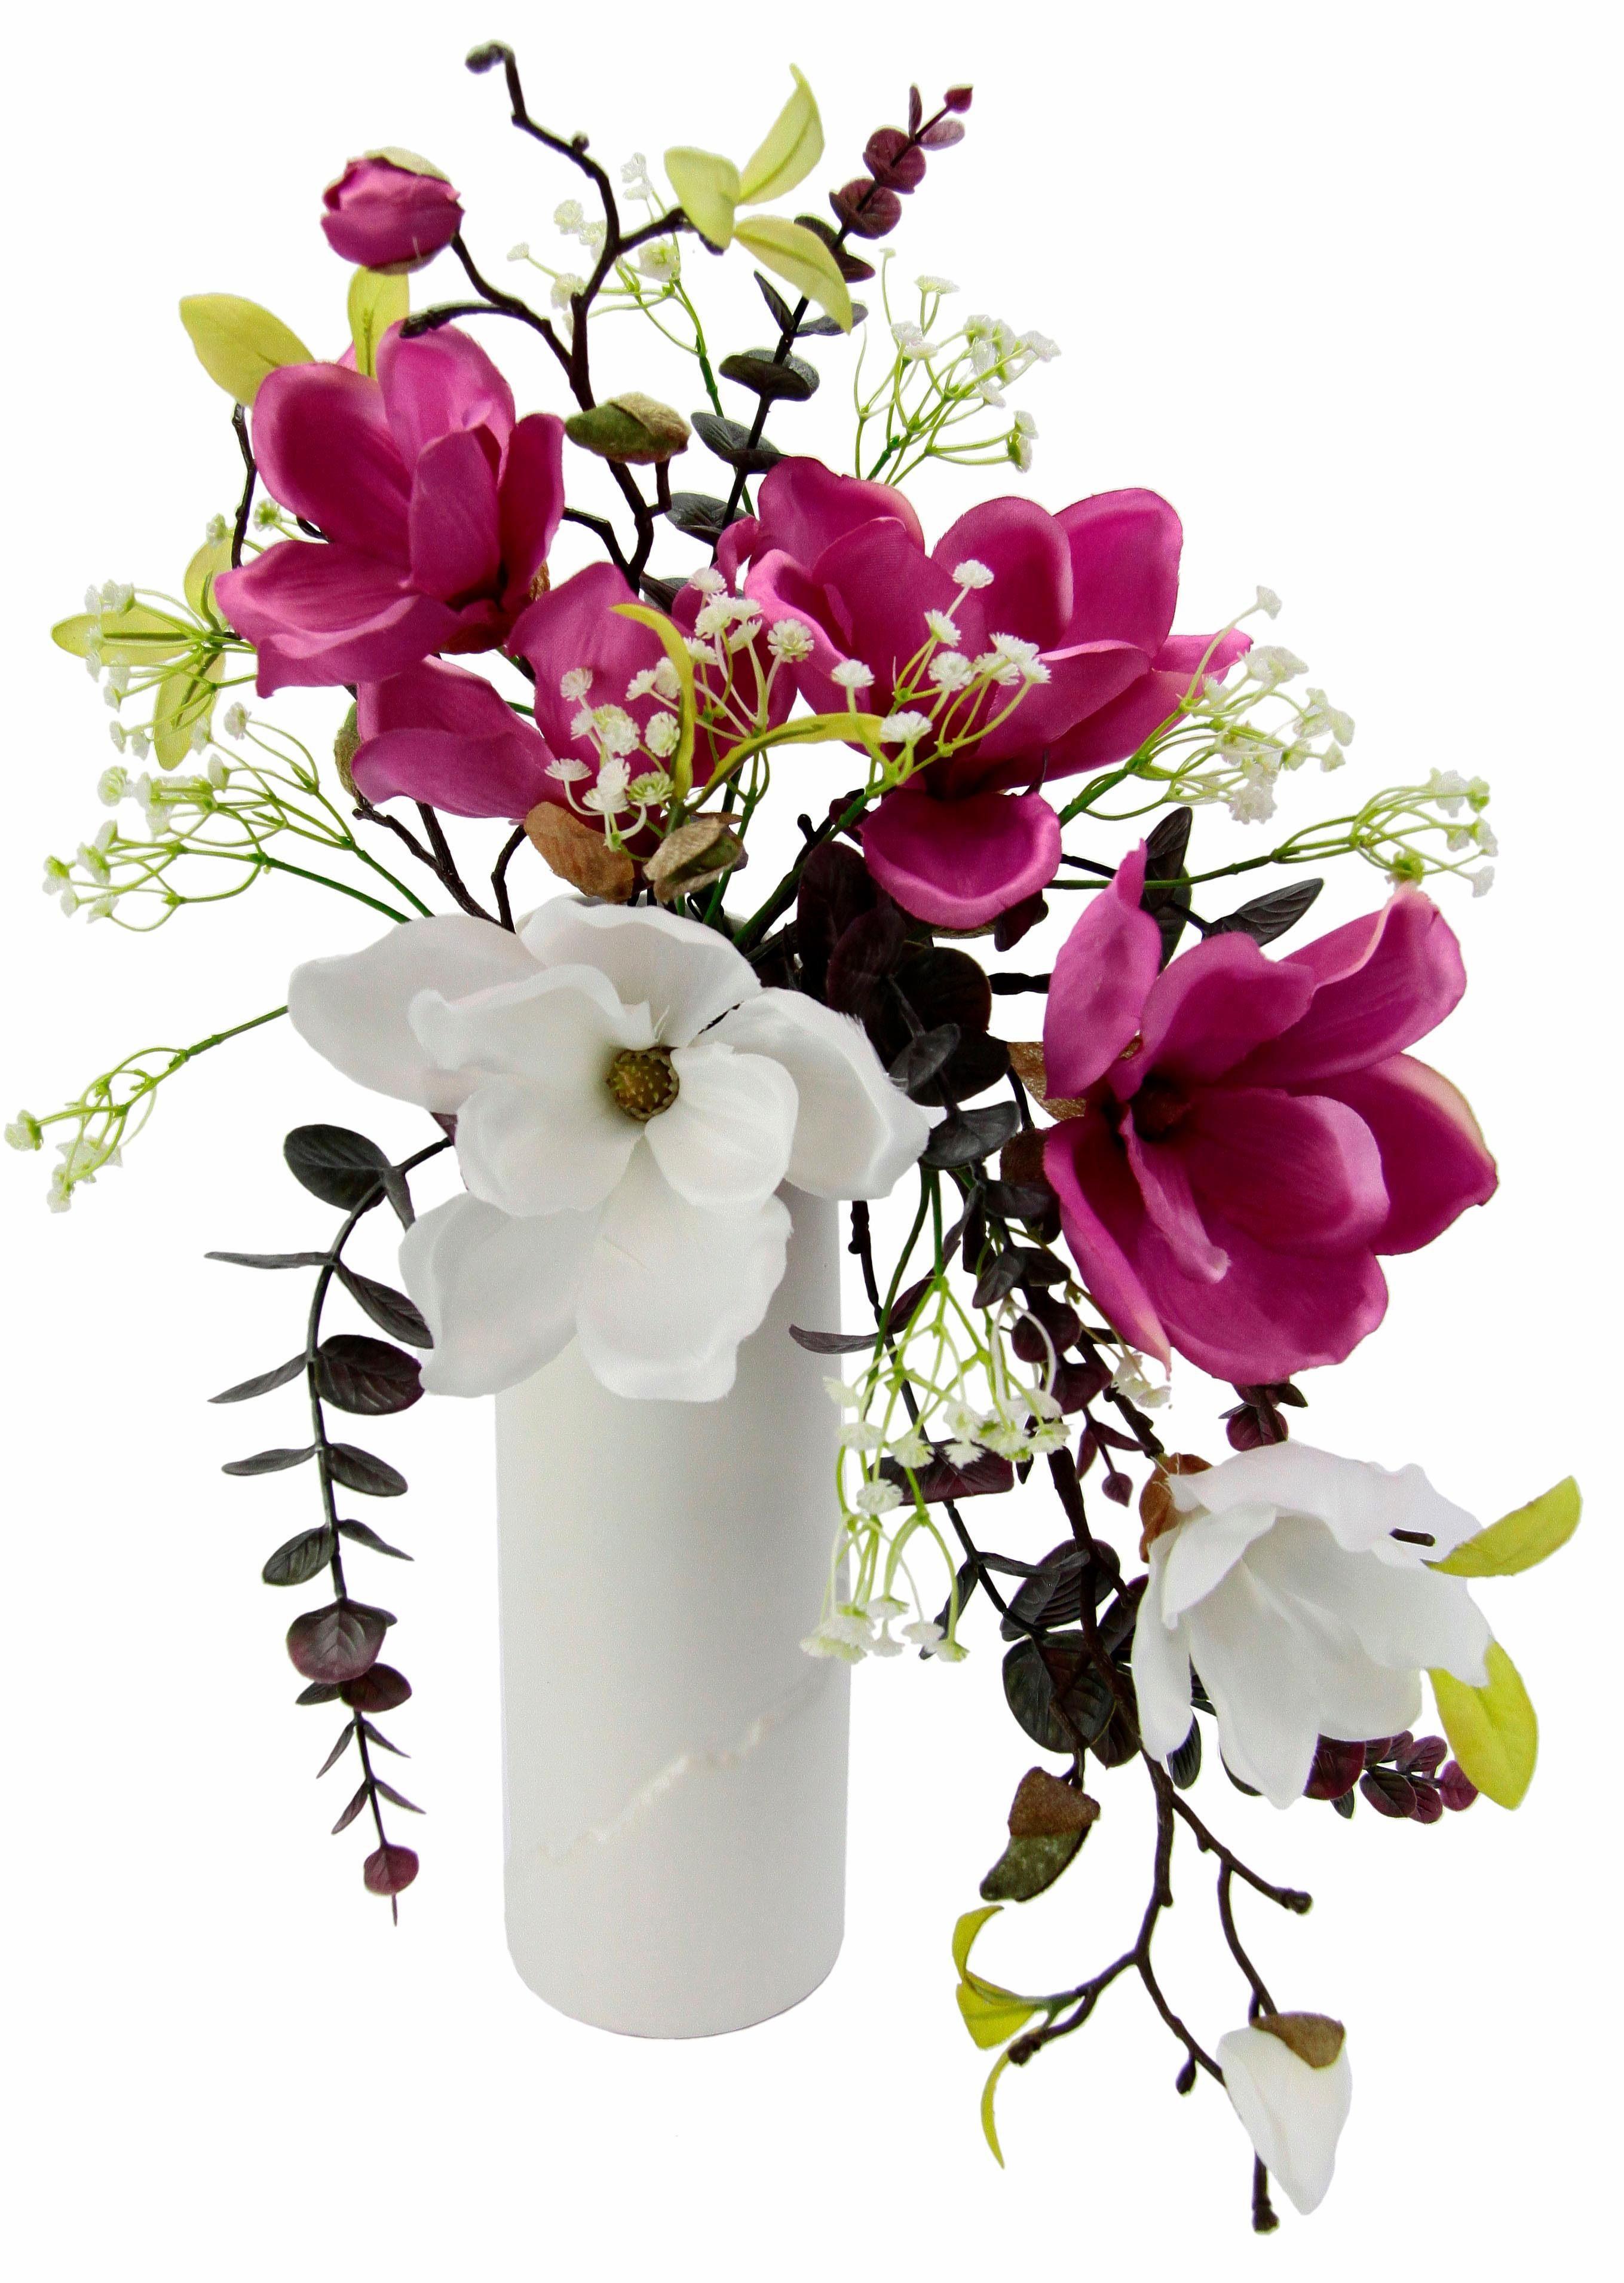 Home affaire Kunstblume »Magnolien« in Vase